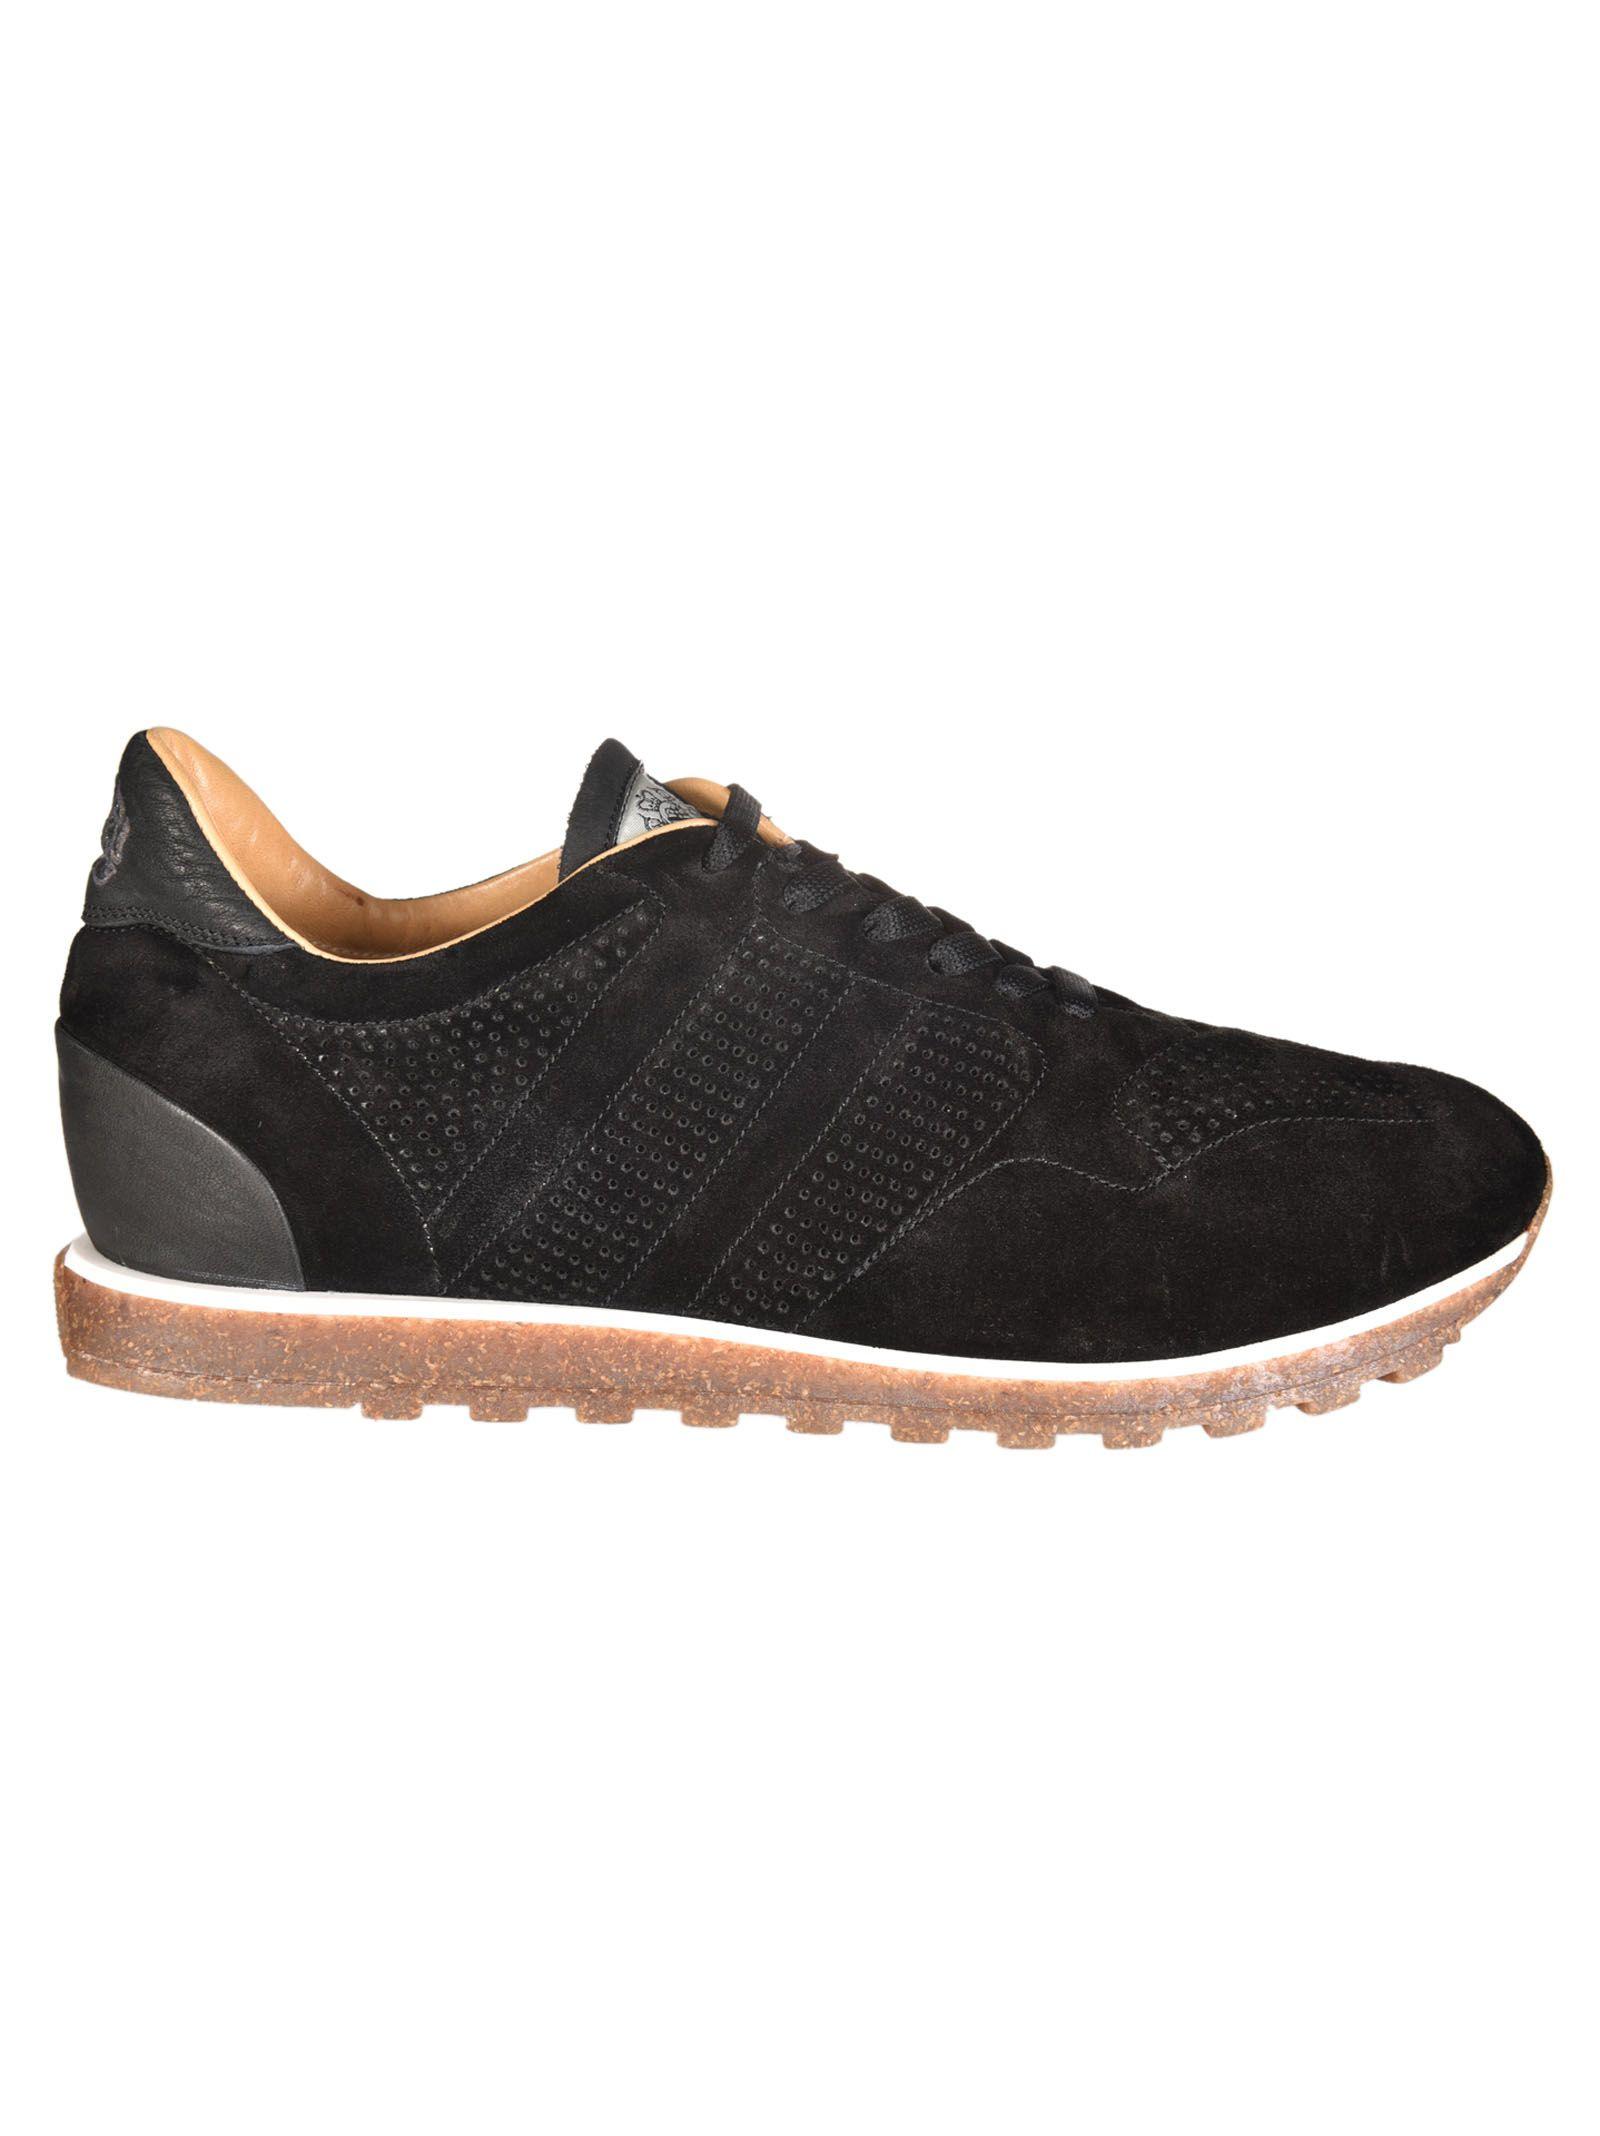 "Alberto Fasciani ""sport"" Sneakers"